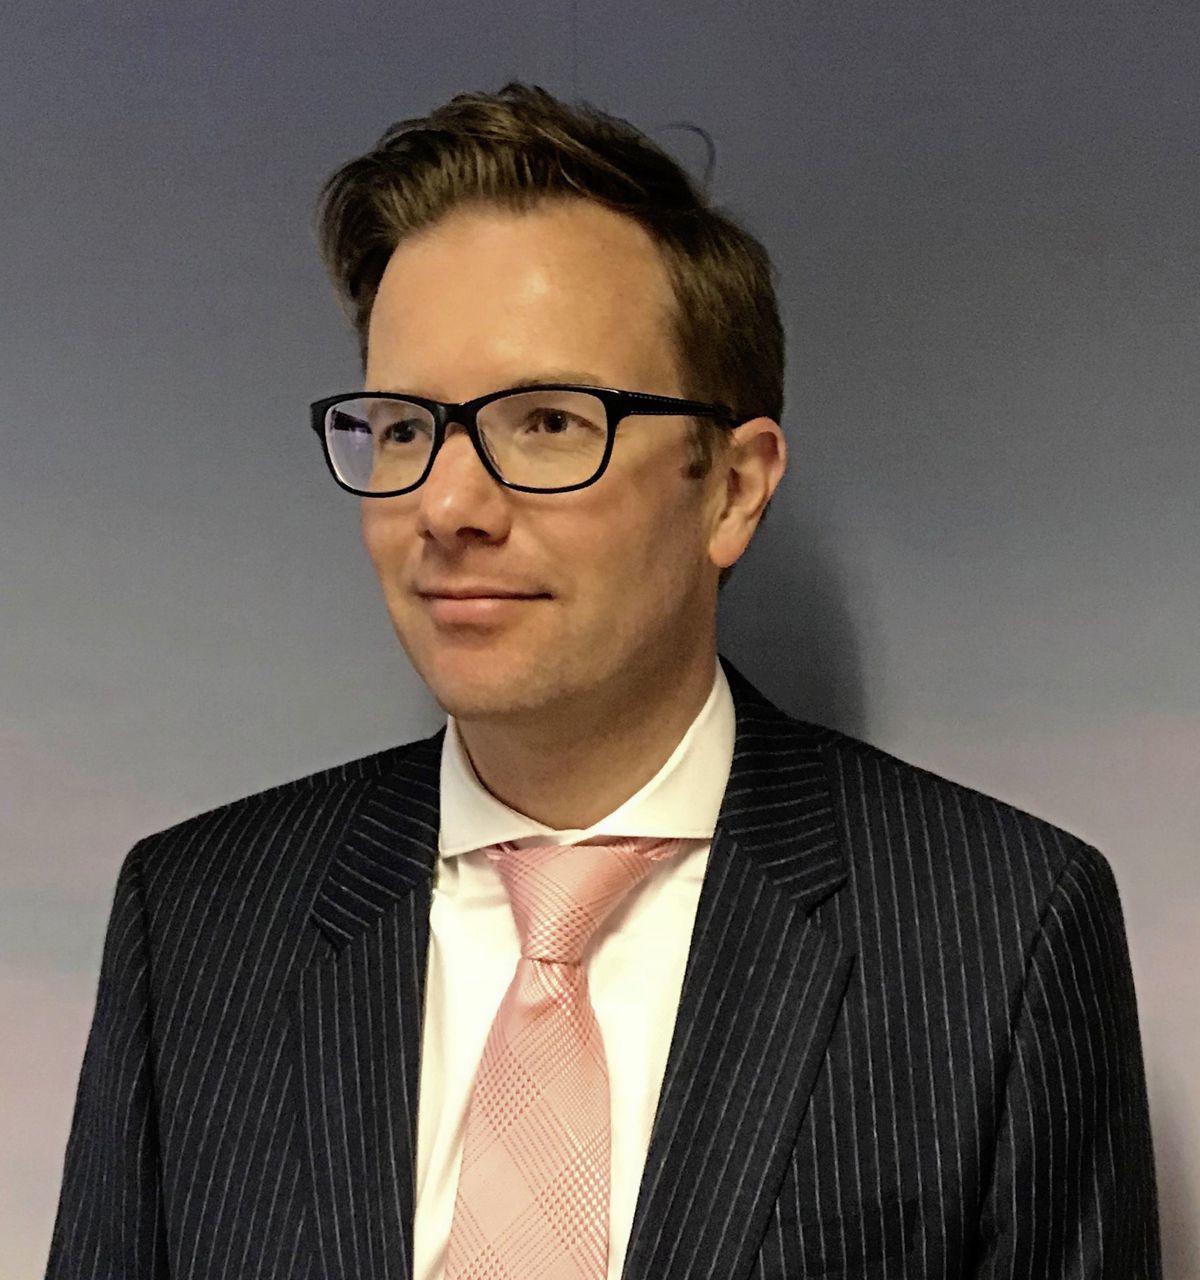 Elwyn Dop, executive director of operations at Condor.